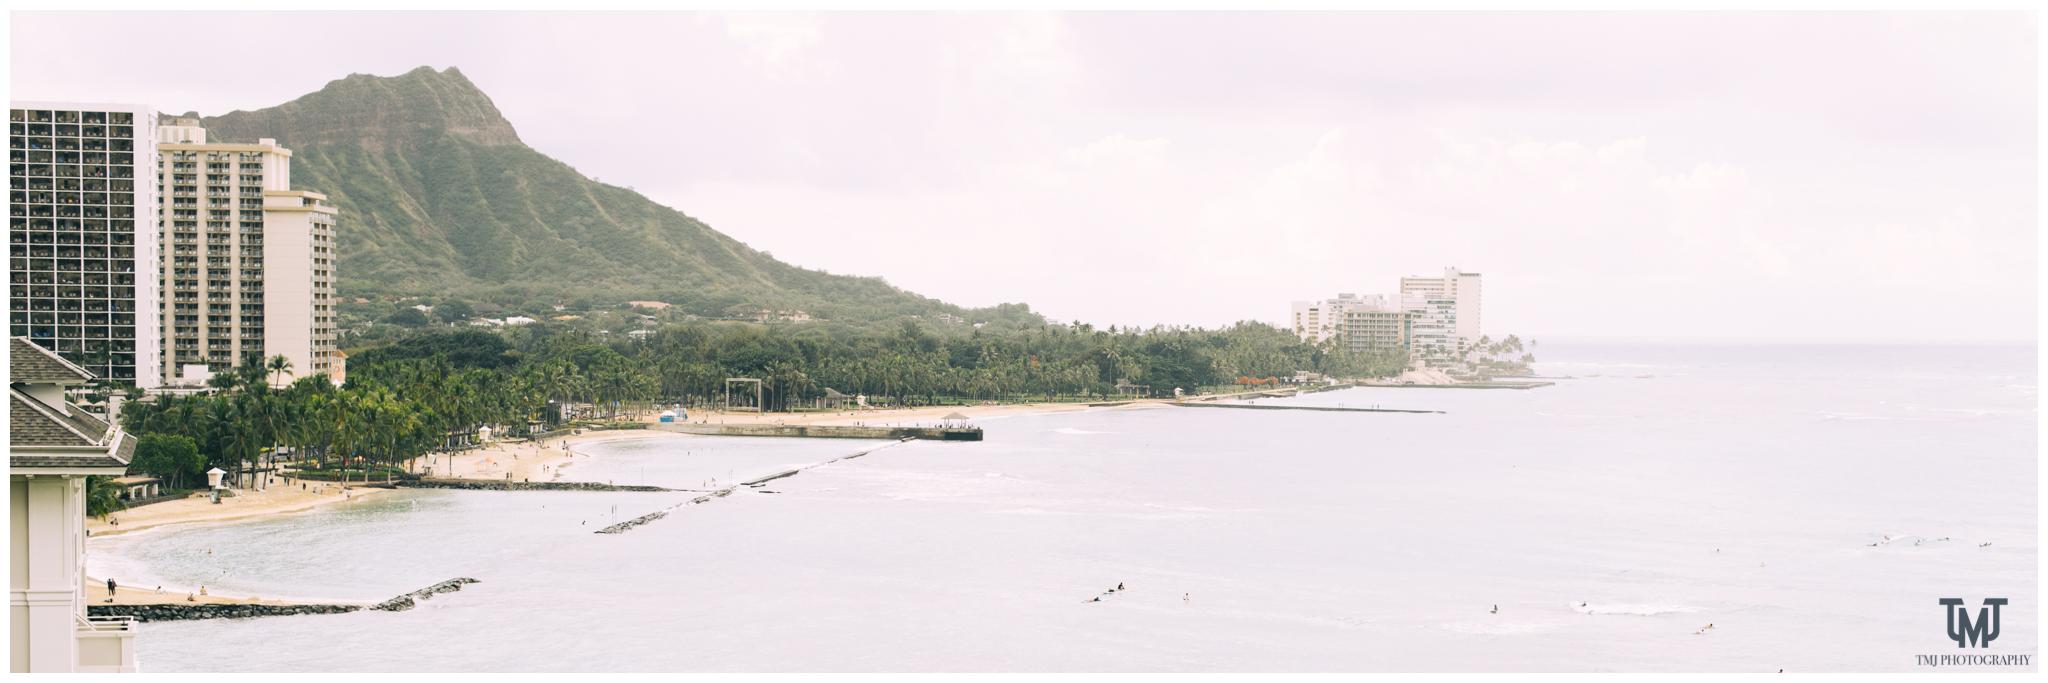 Moana Surfrider Terrace By The Sea Honolulu Destination Wedding 007.jpg